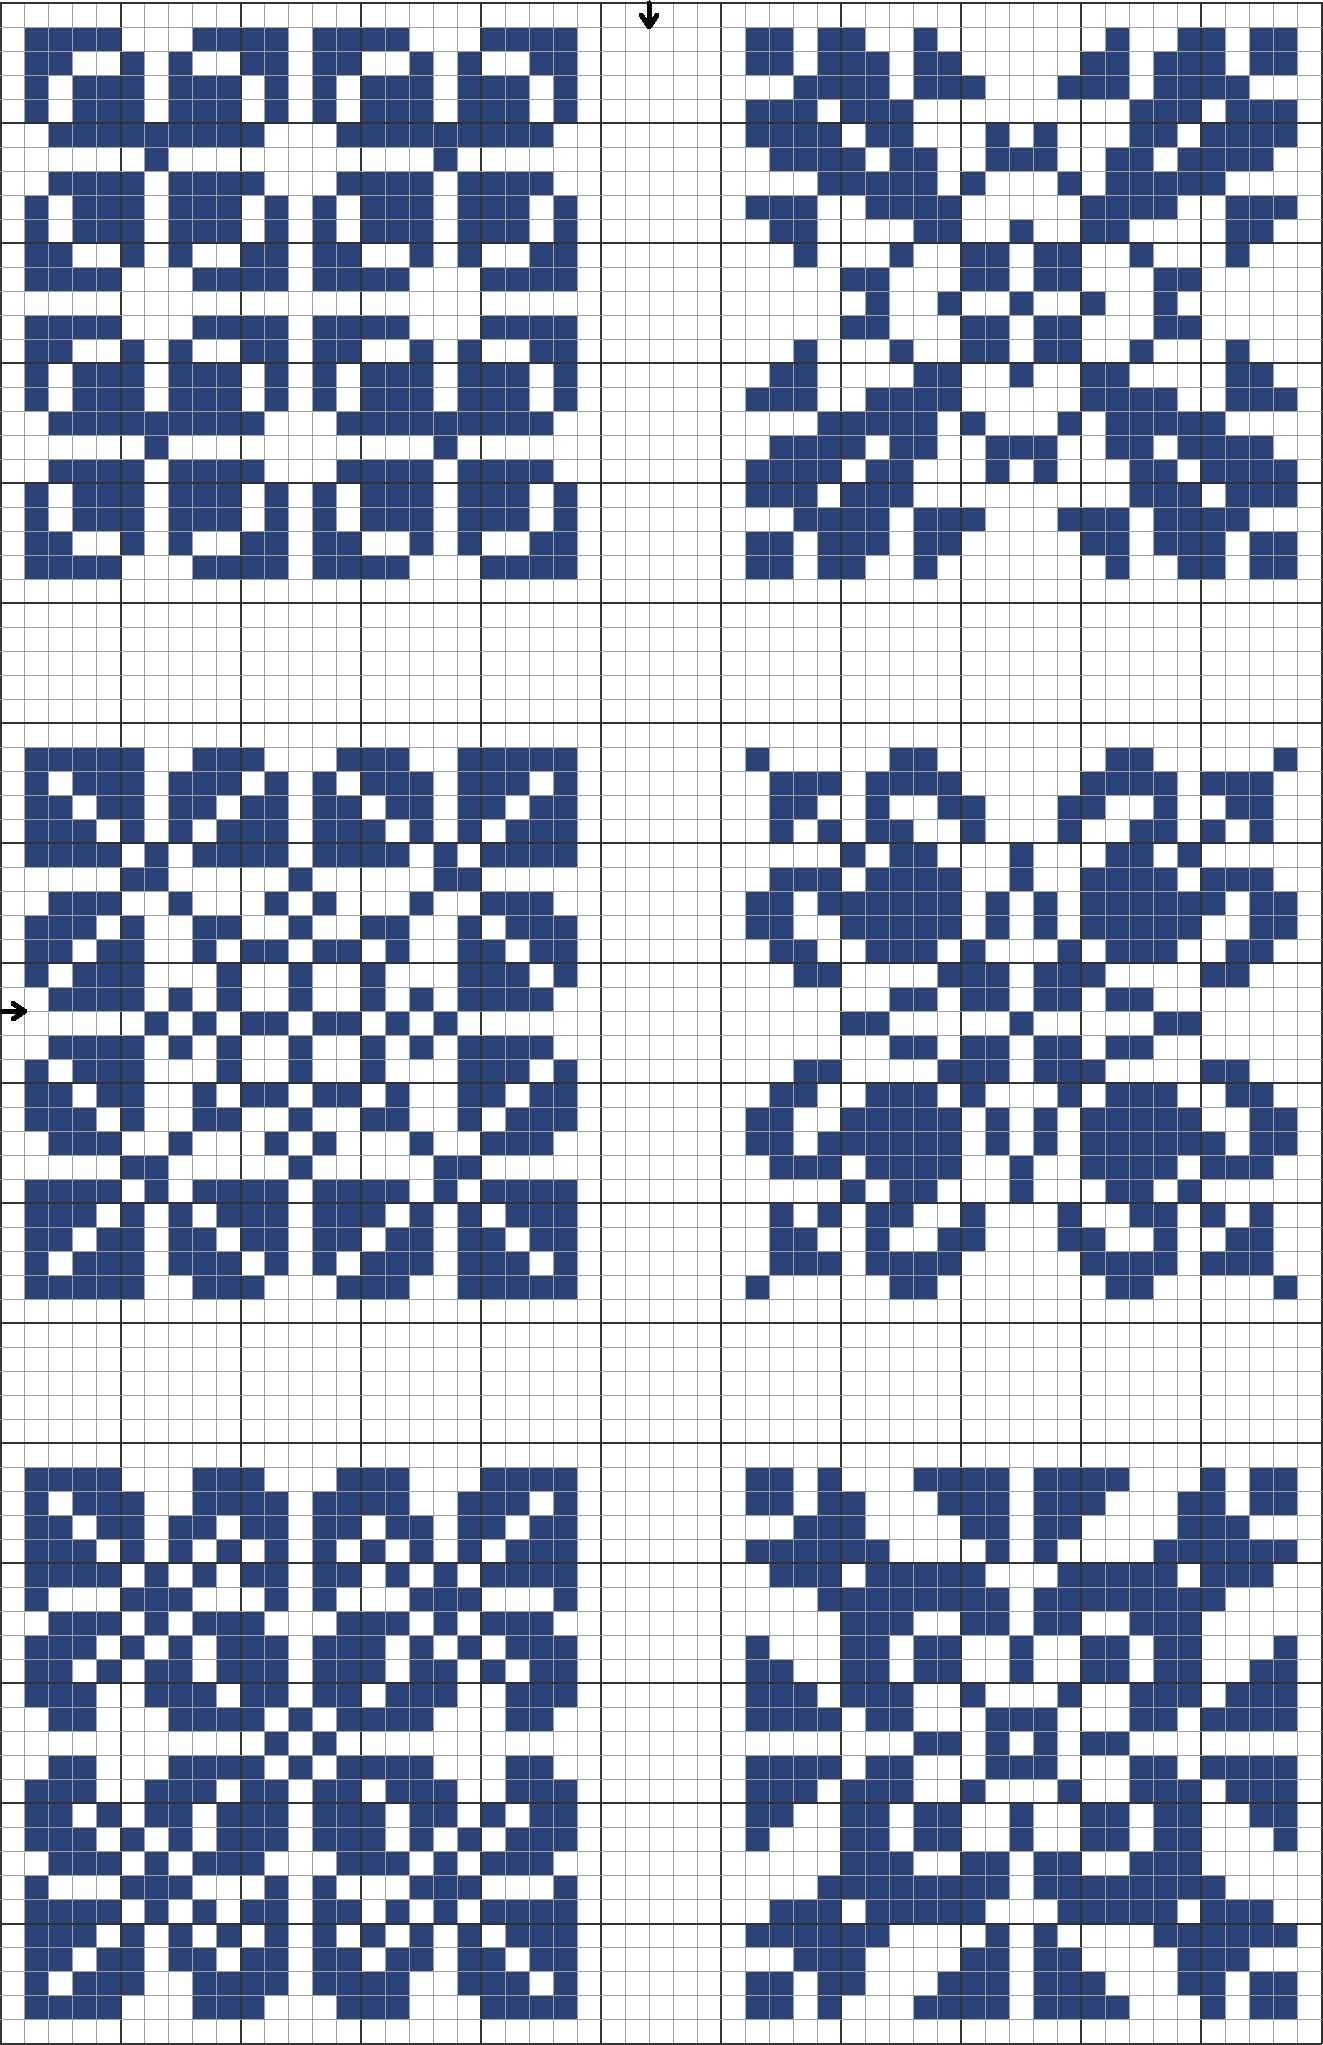 Cross stitch decorative tile template. Blue tiles 03 | Stranded ...